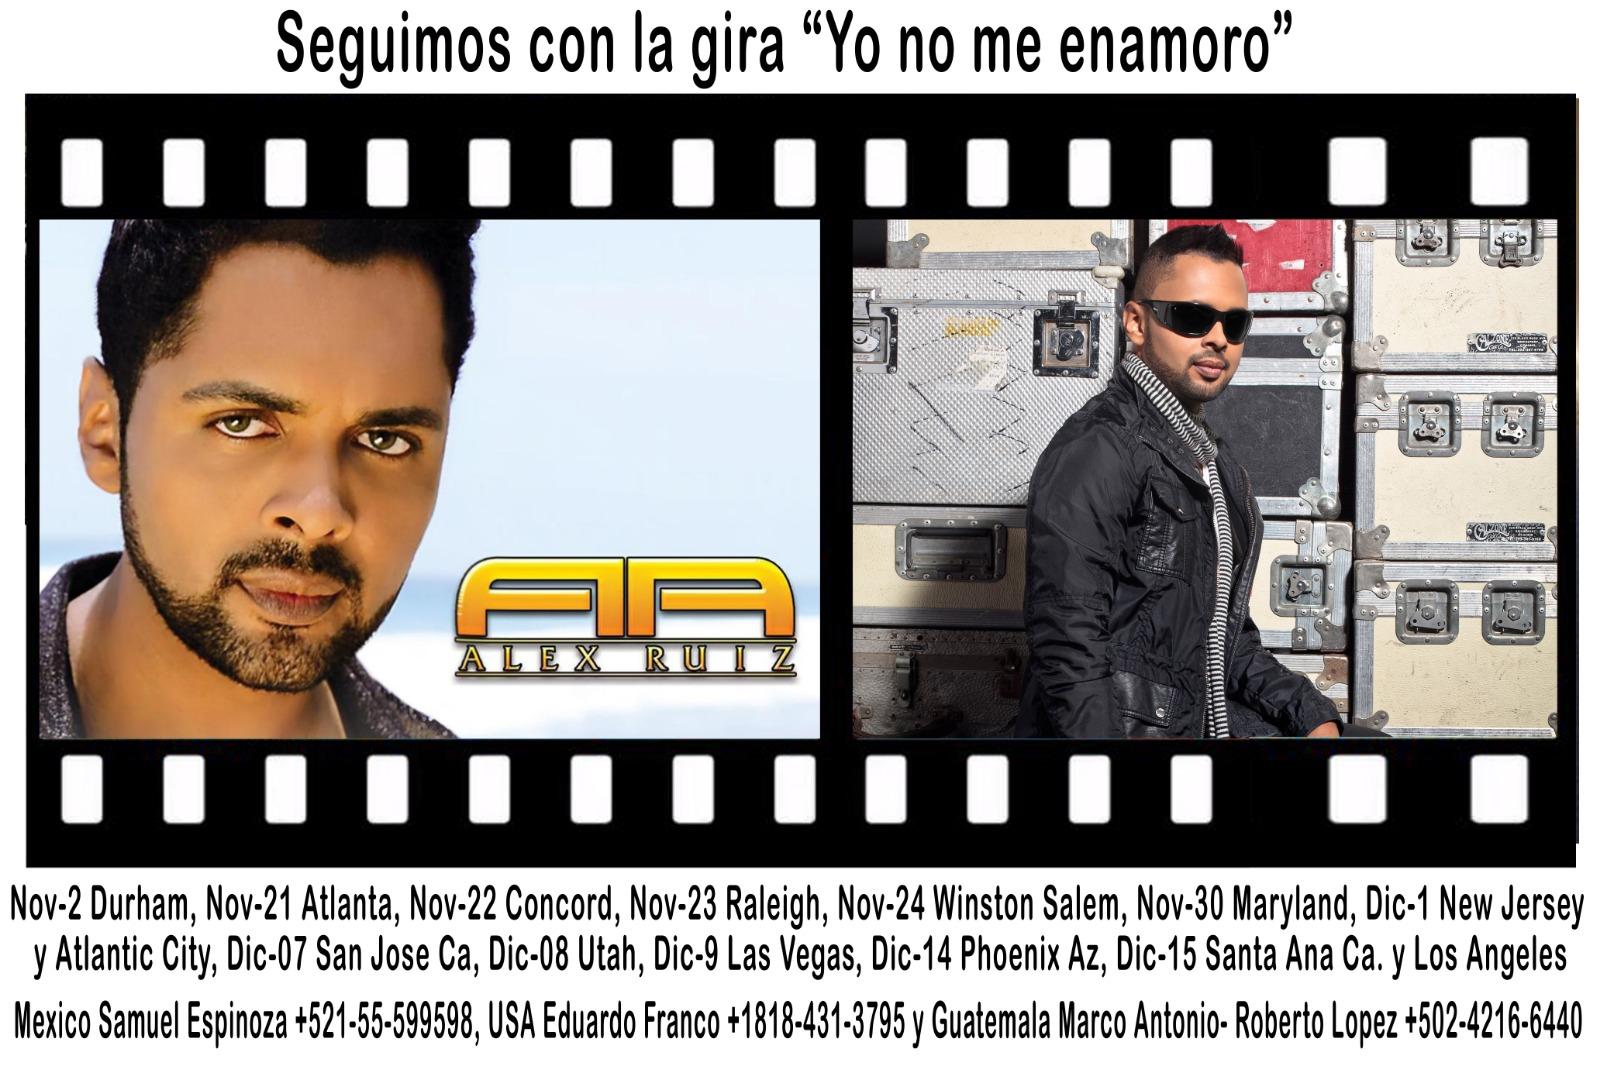 Alex Ruiz, agenda